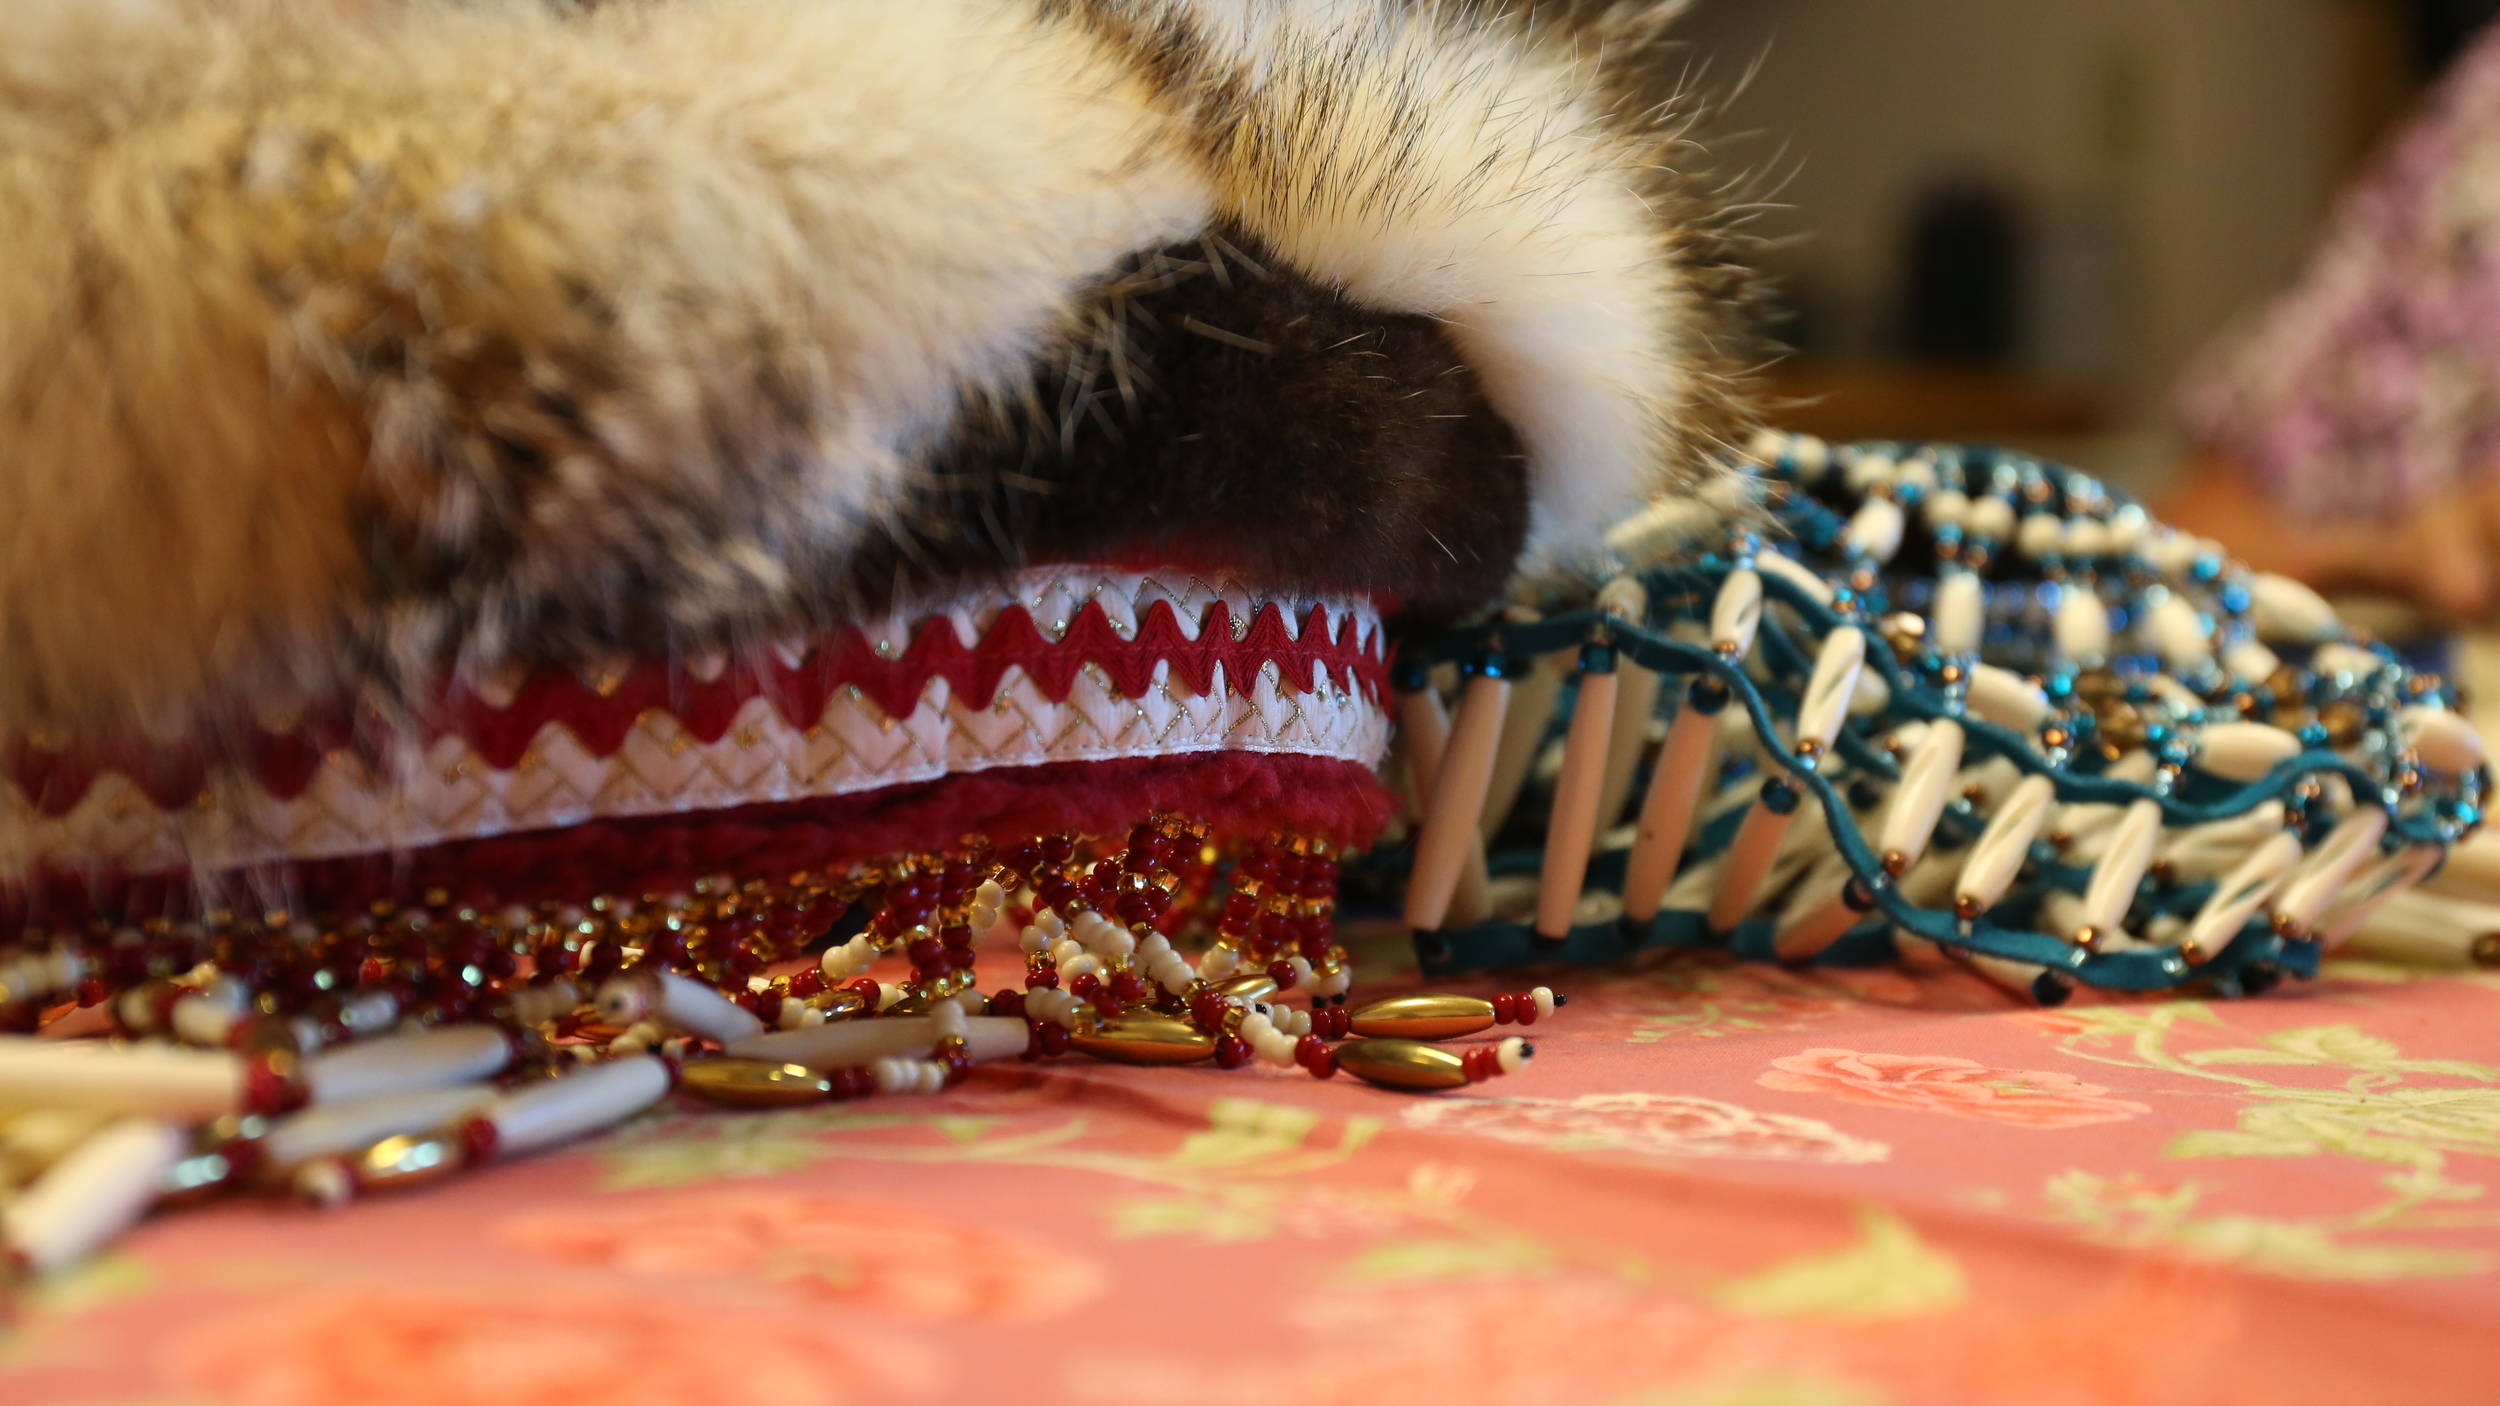 Native Eyak Headdresses made by Jackie Ladd, the Elder Care Coordinator at the Native Village of Eyak